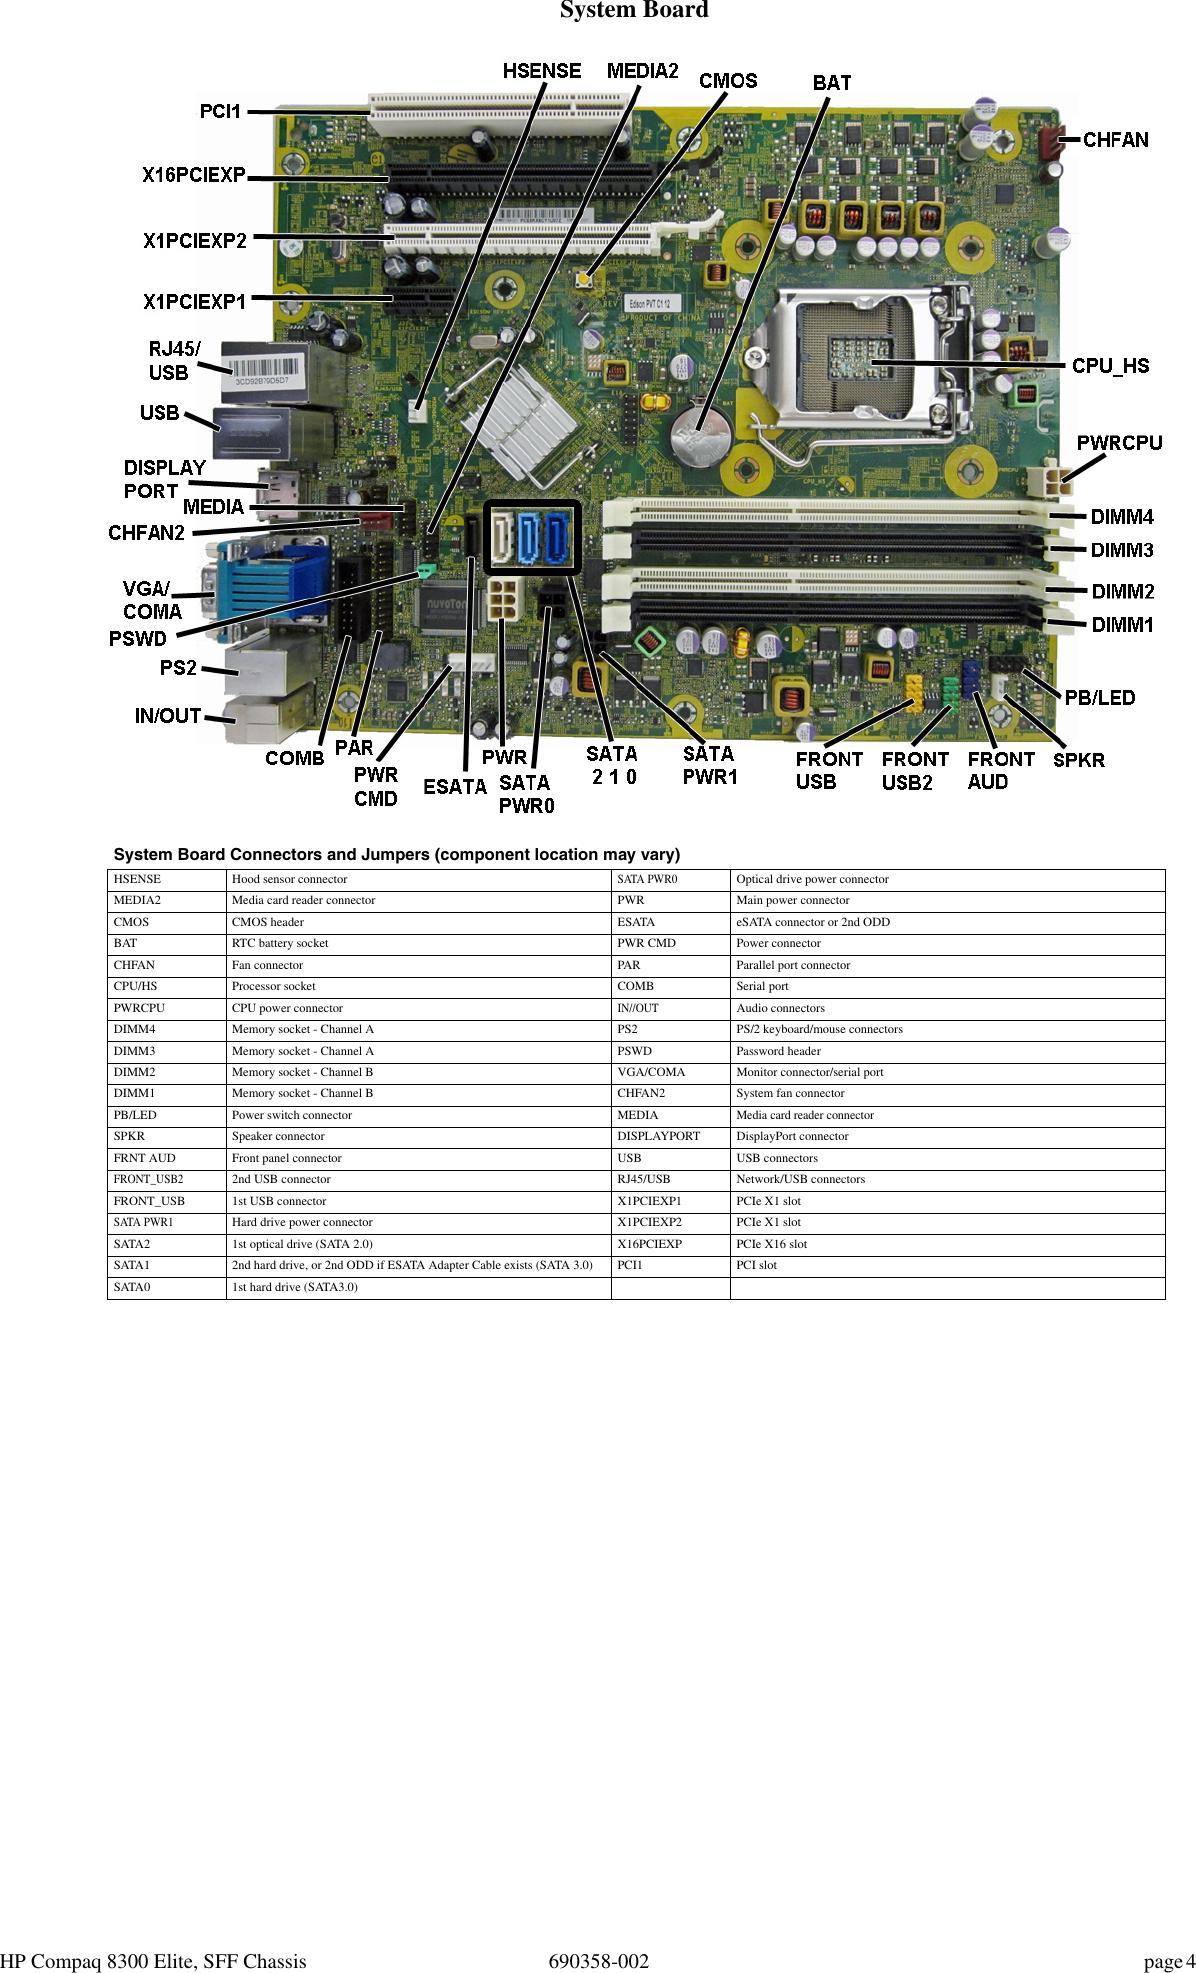 hp dx5150 mt motherboard manual